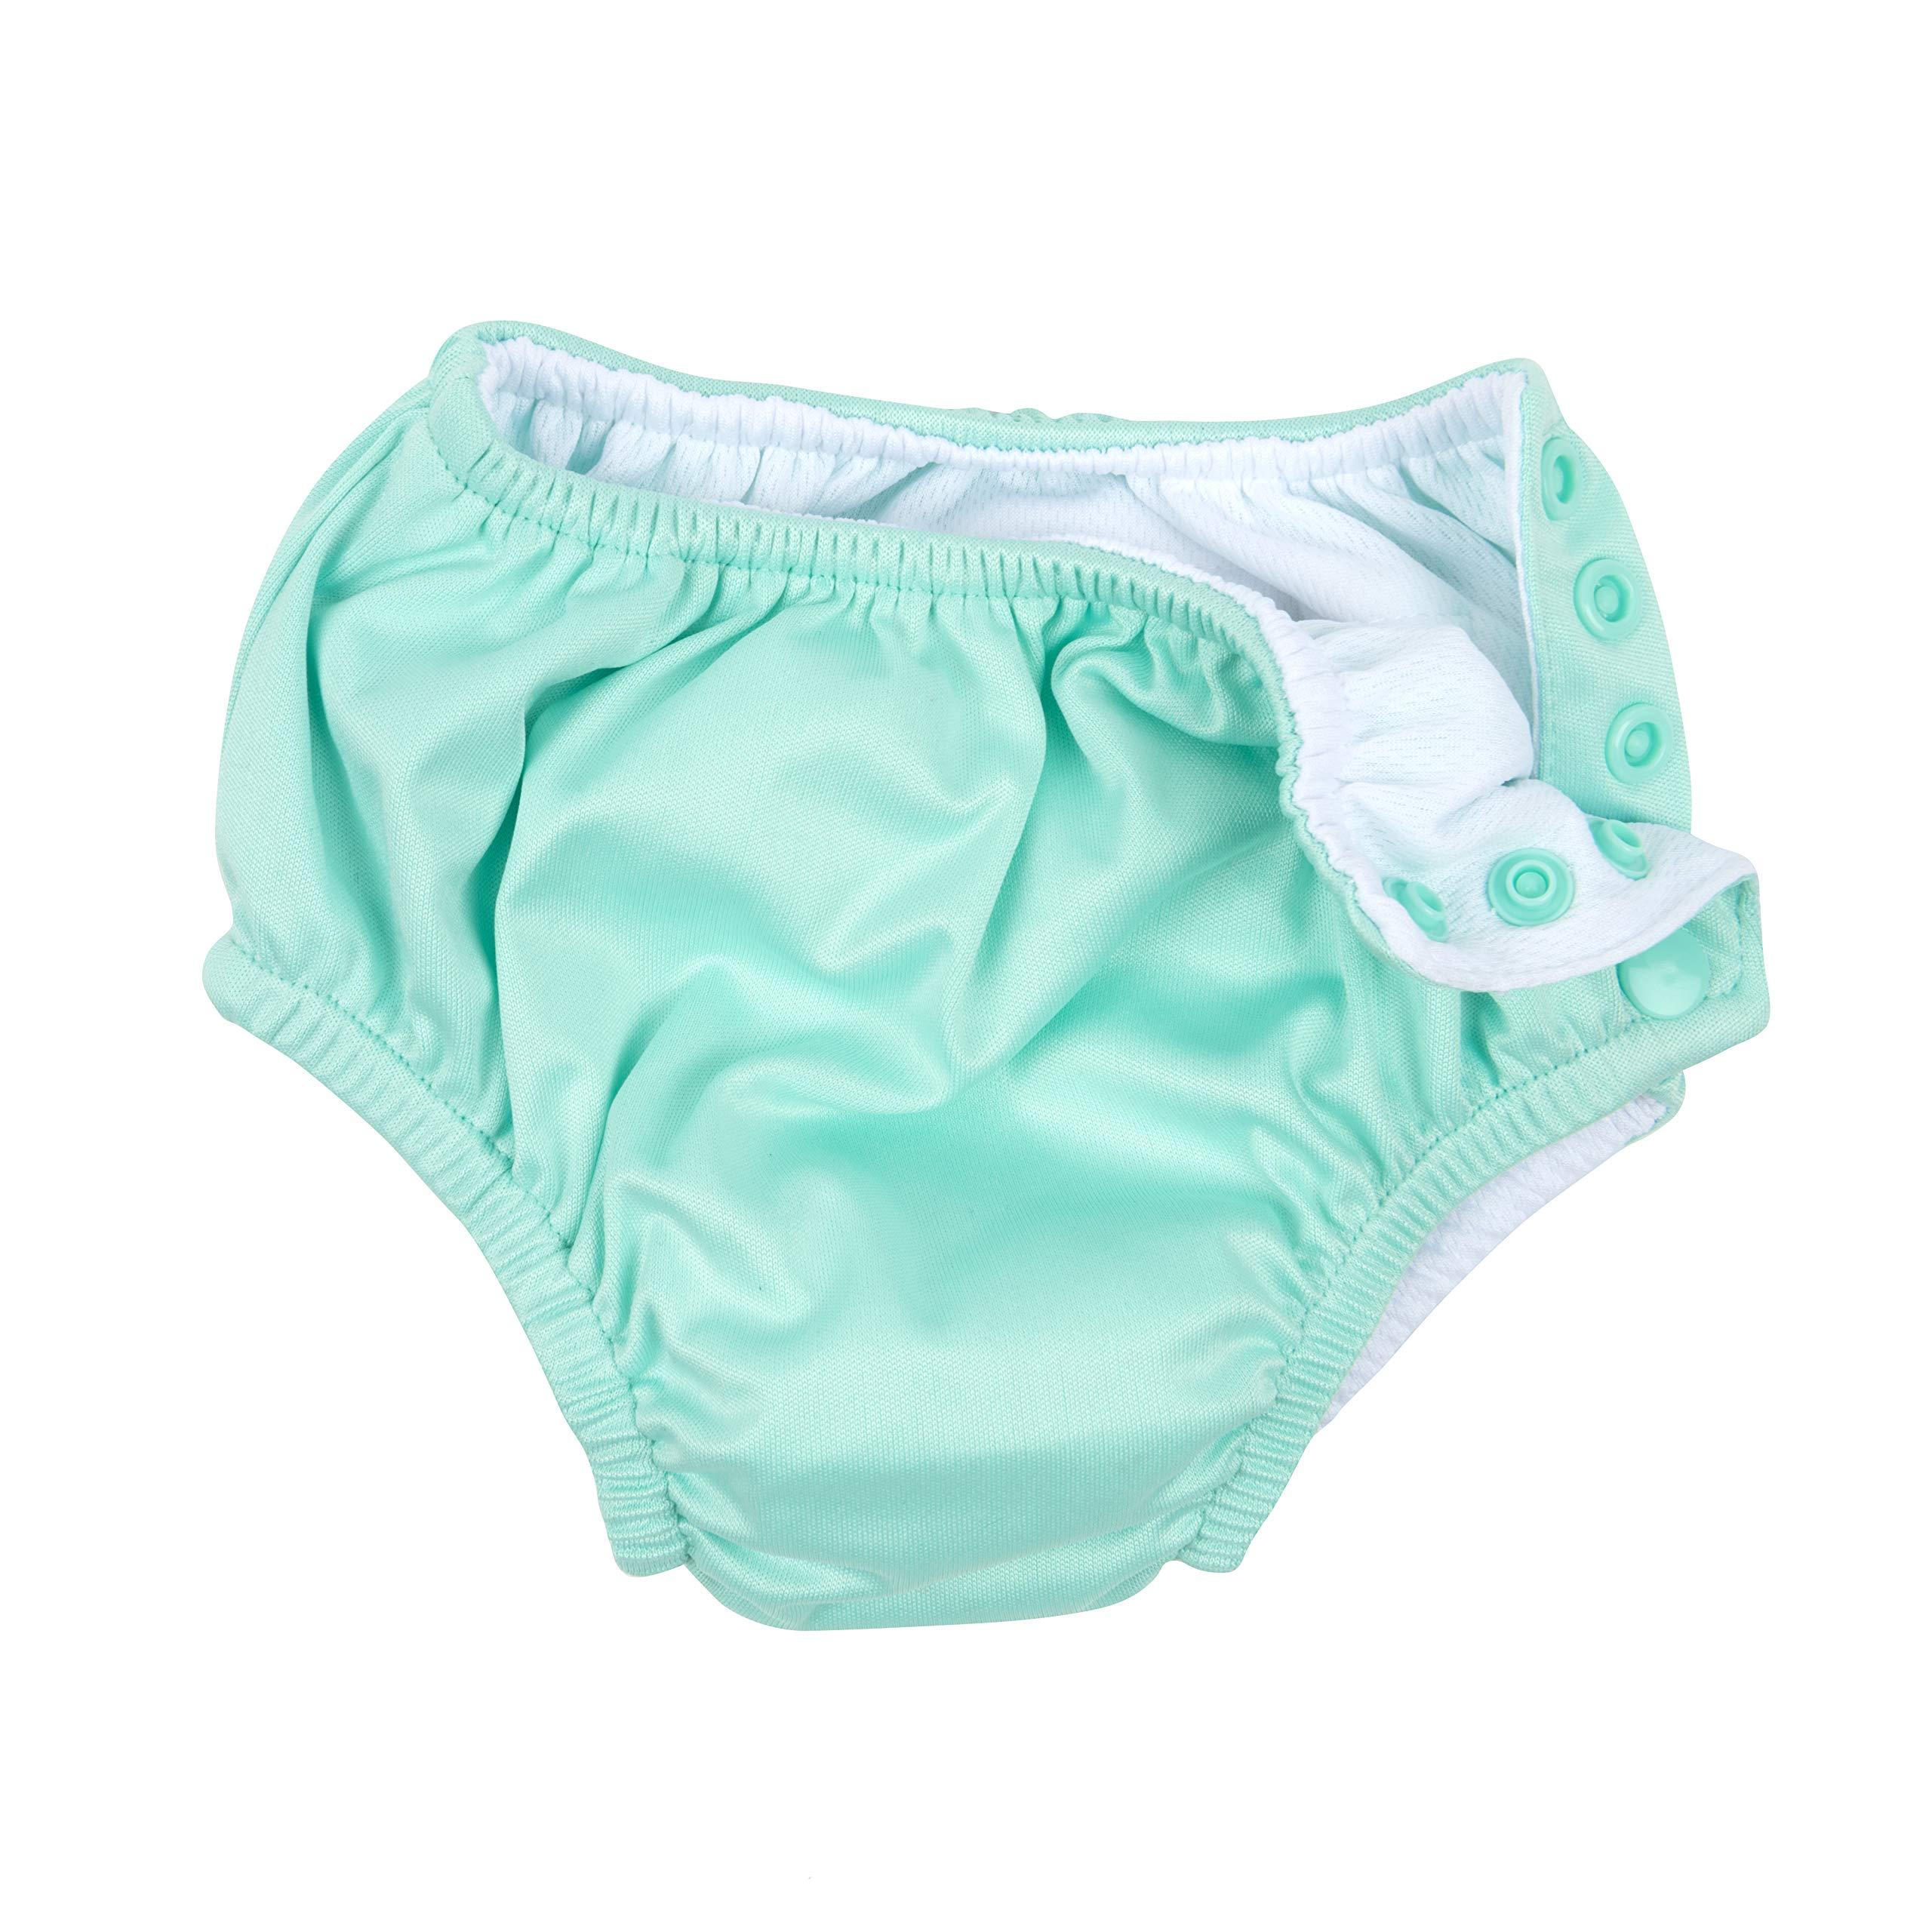 White Size 2 Toddler Leveret Kids Baby Boys Girls Reusable Absorbent Swim Diaper UPF 50